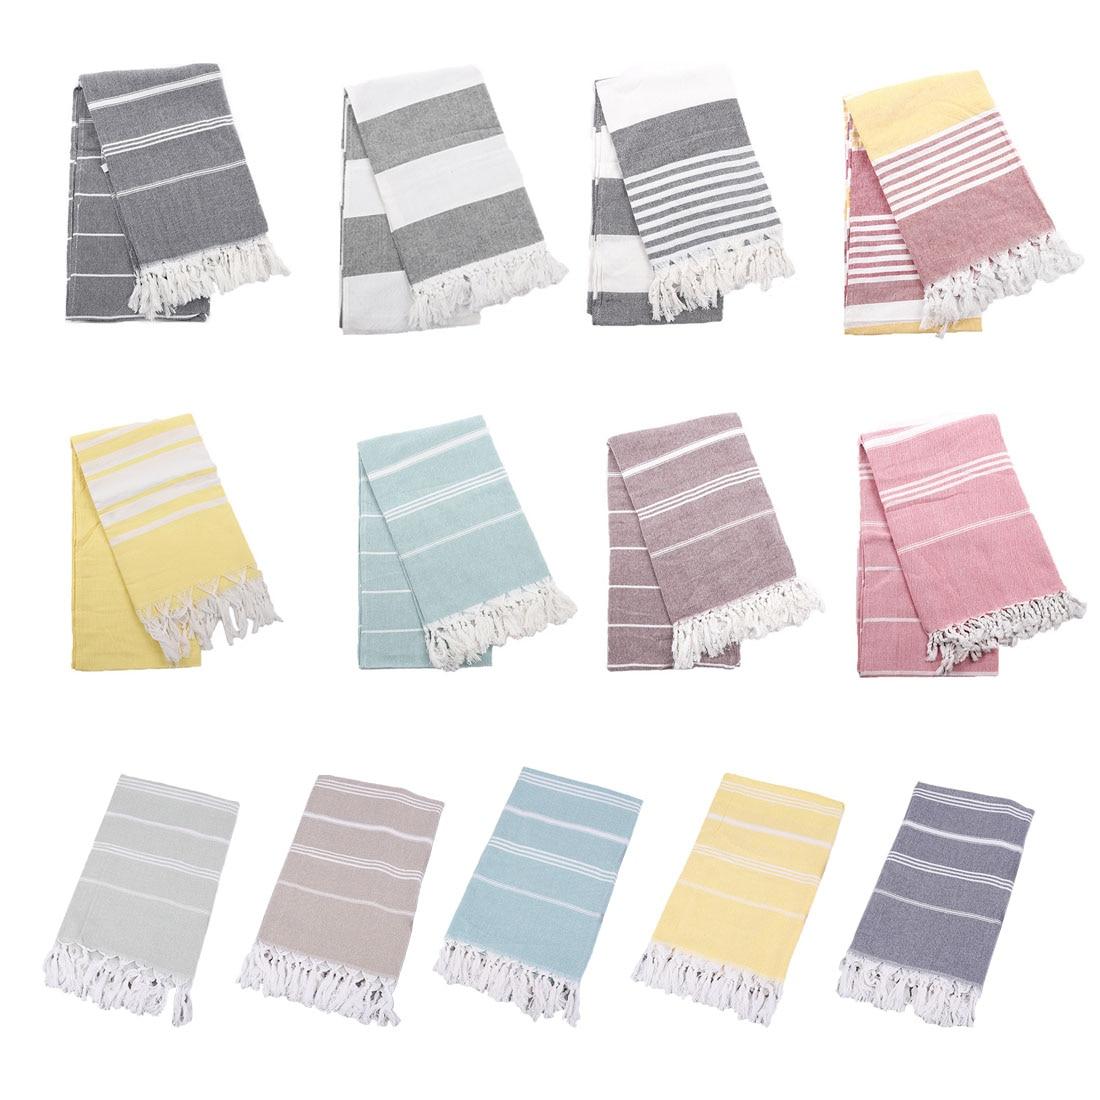 Aliexpress.com : Buy Turkish Beach Towels 100*180 Cm 100